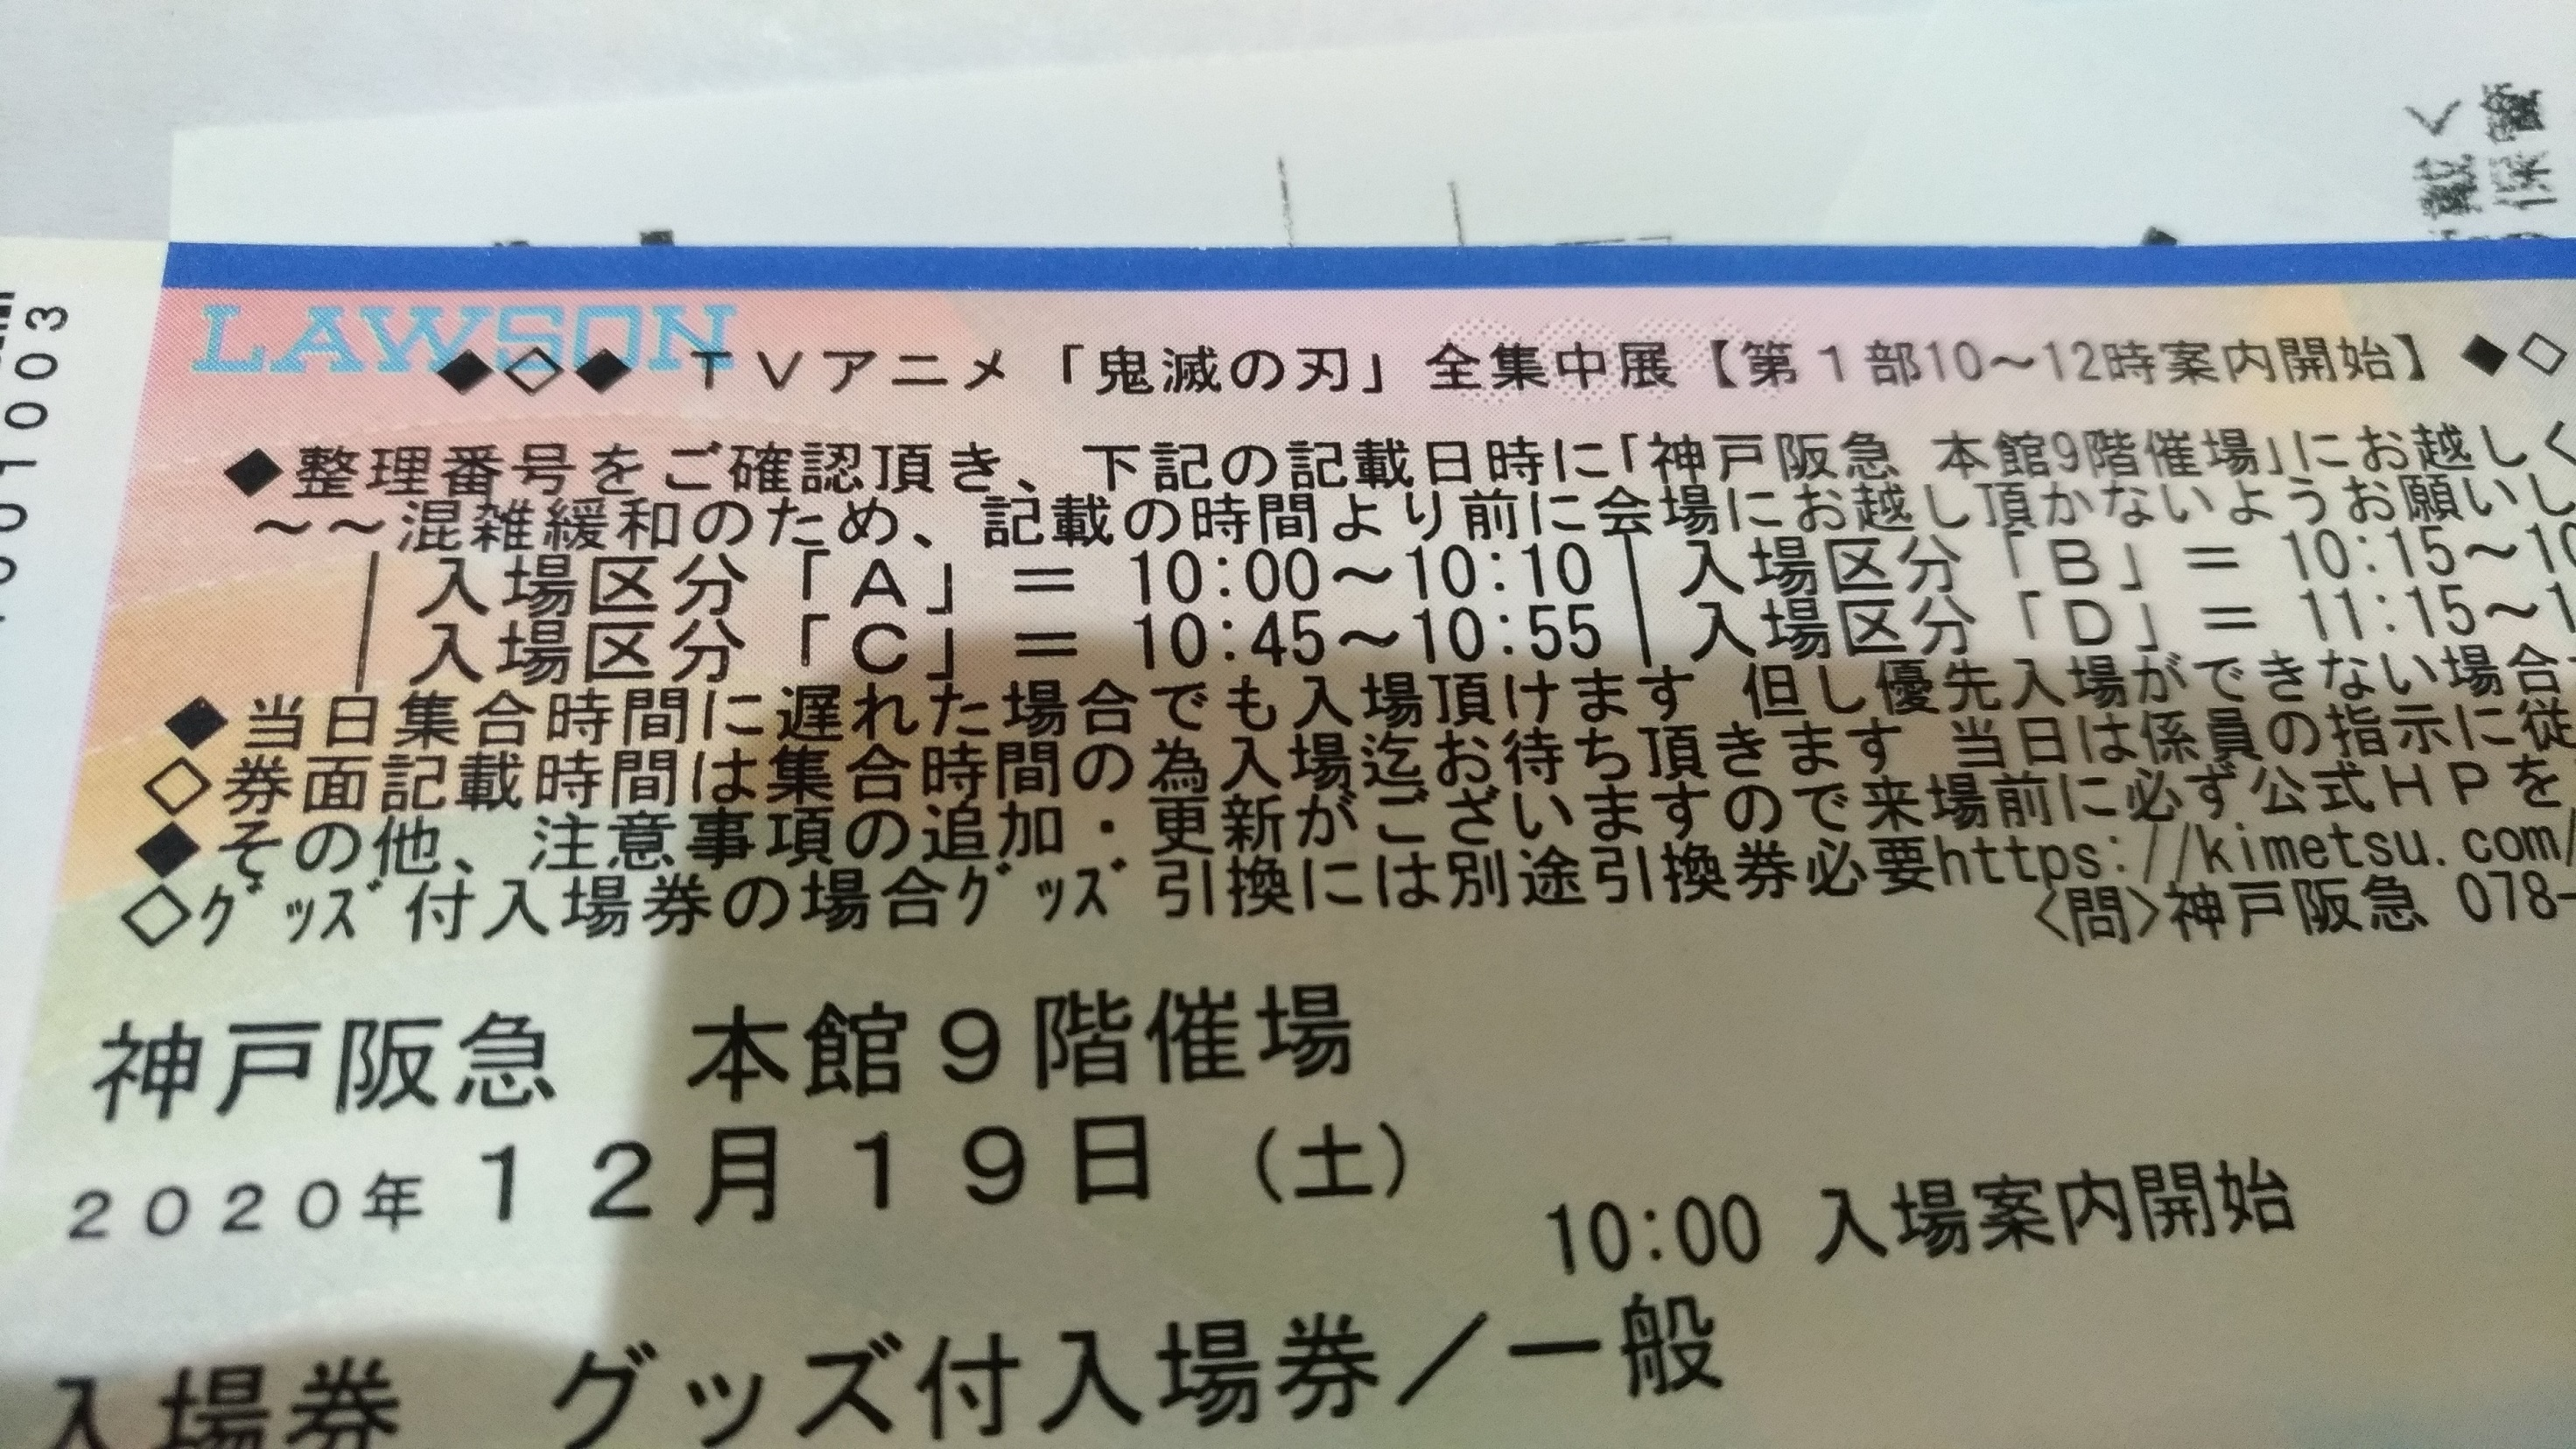 kimetsu_yaiba_2020_1219_events_kobe_4.jpg